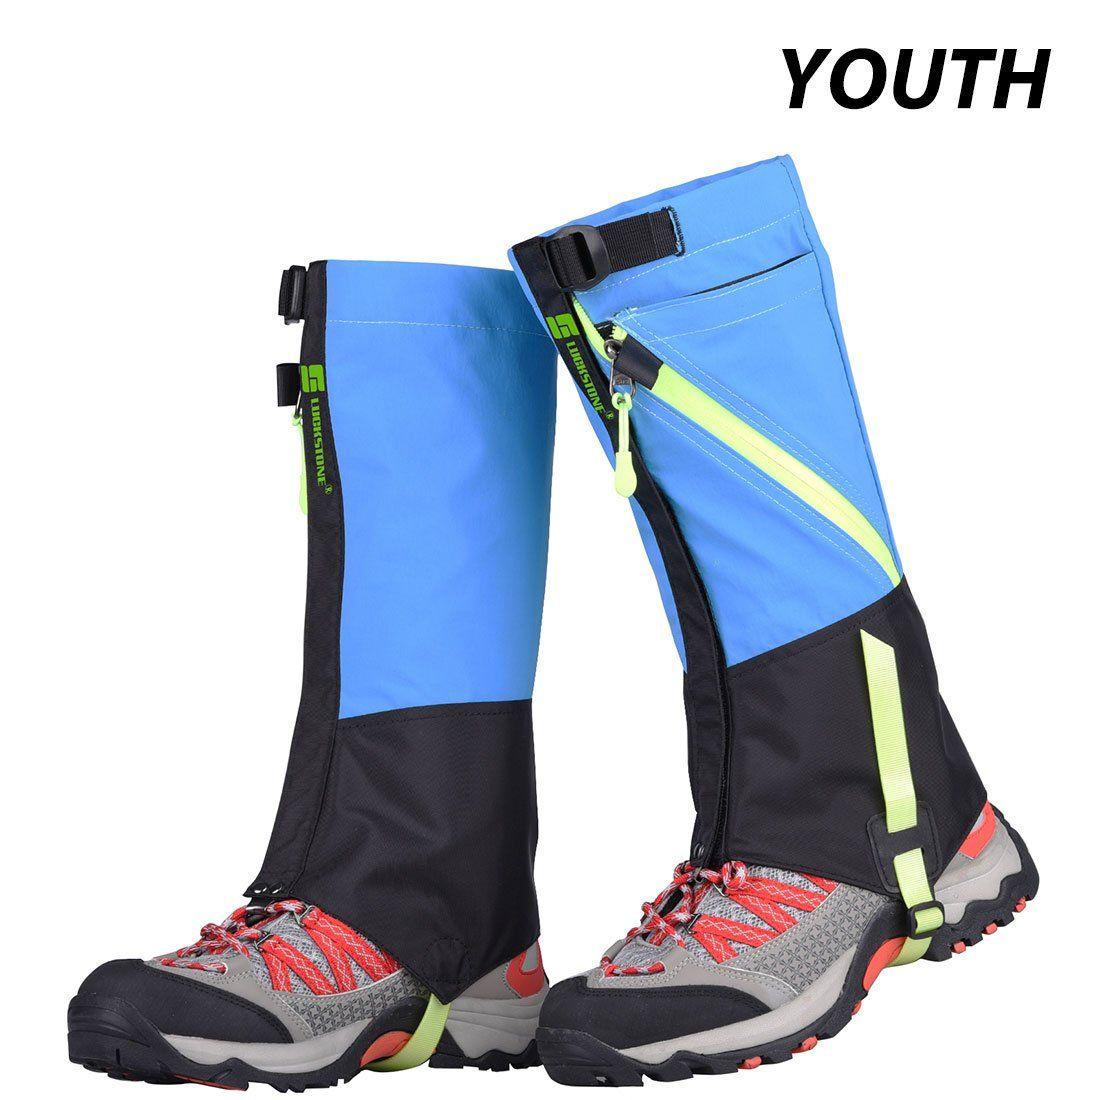 UK Waterproof Legging Gaiters Teekking Hiking Desert Snow Boots Shoes Covers